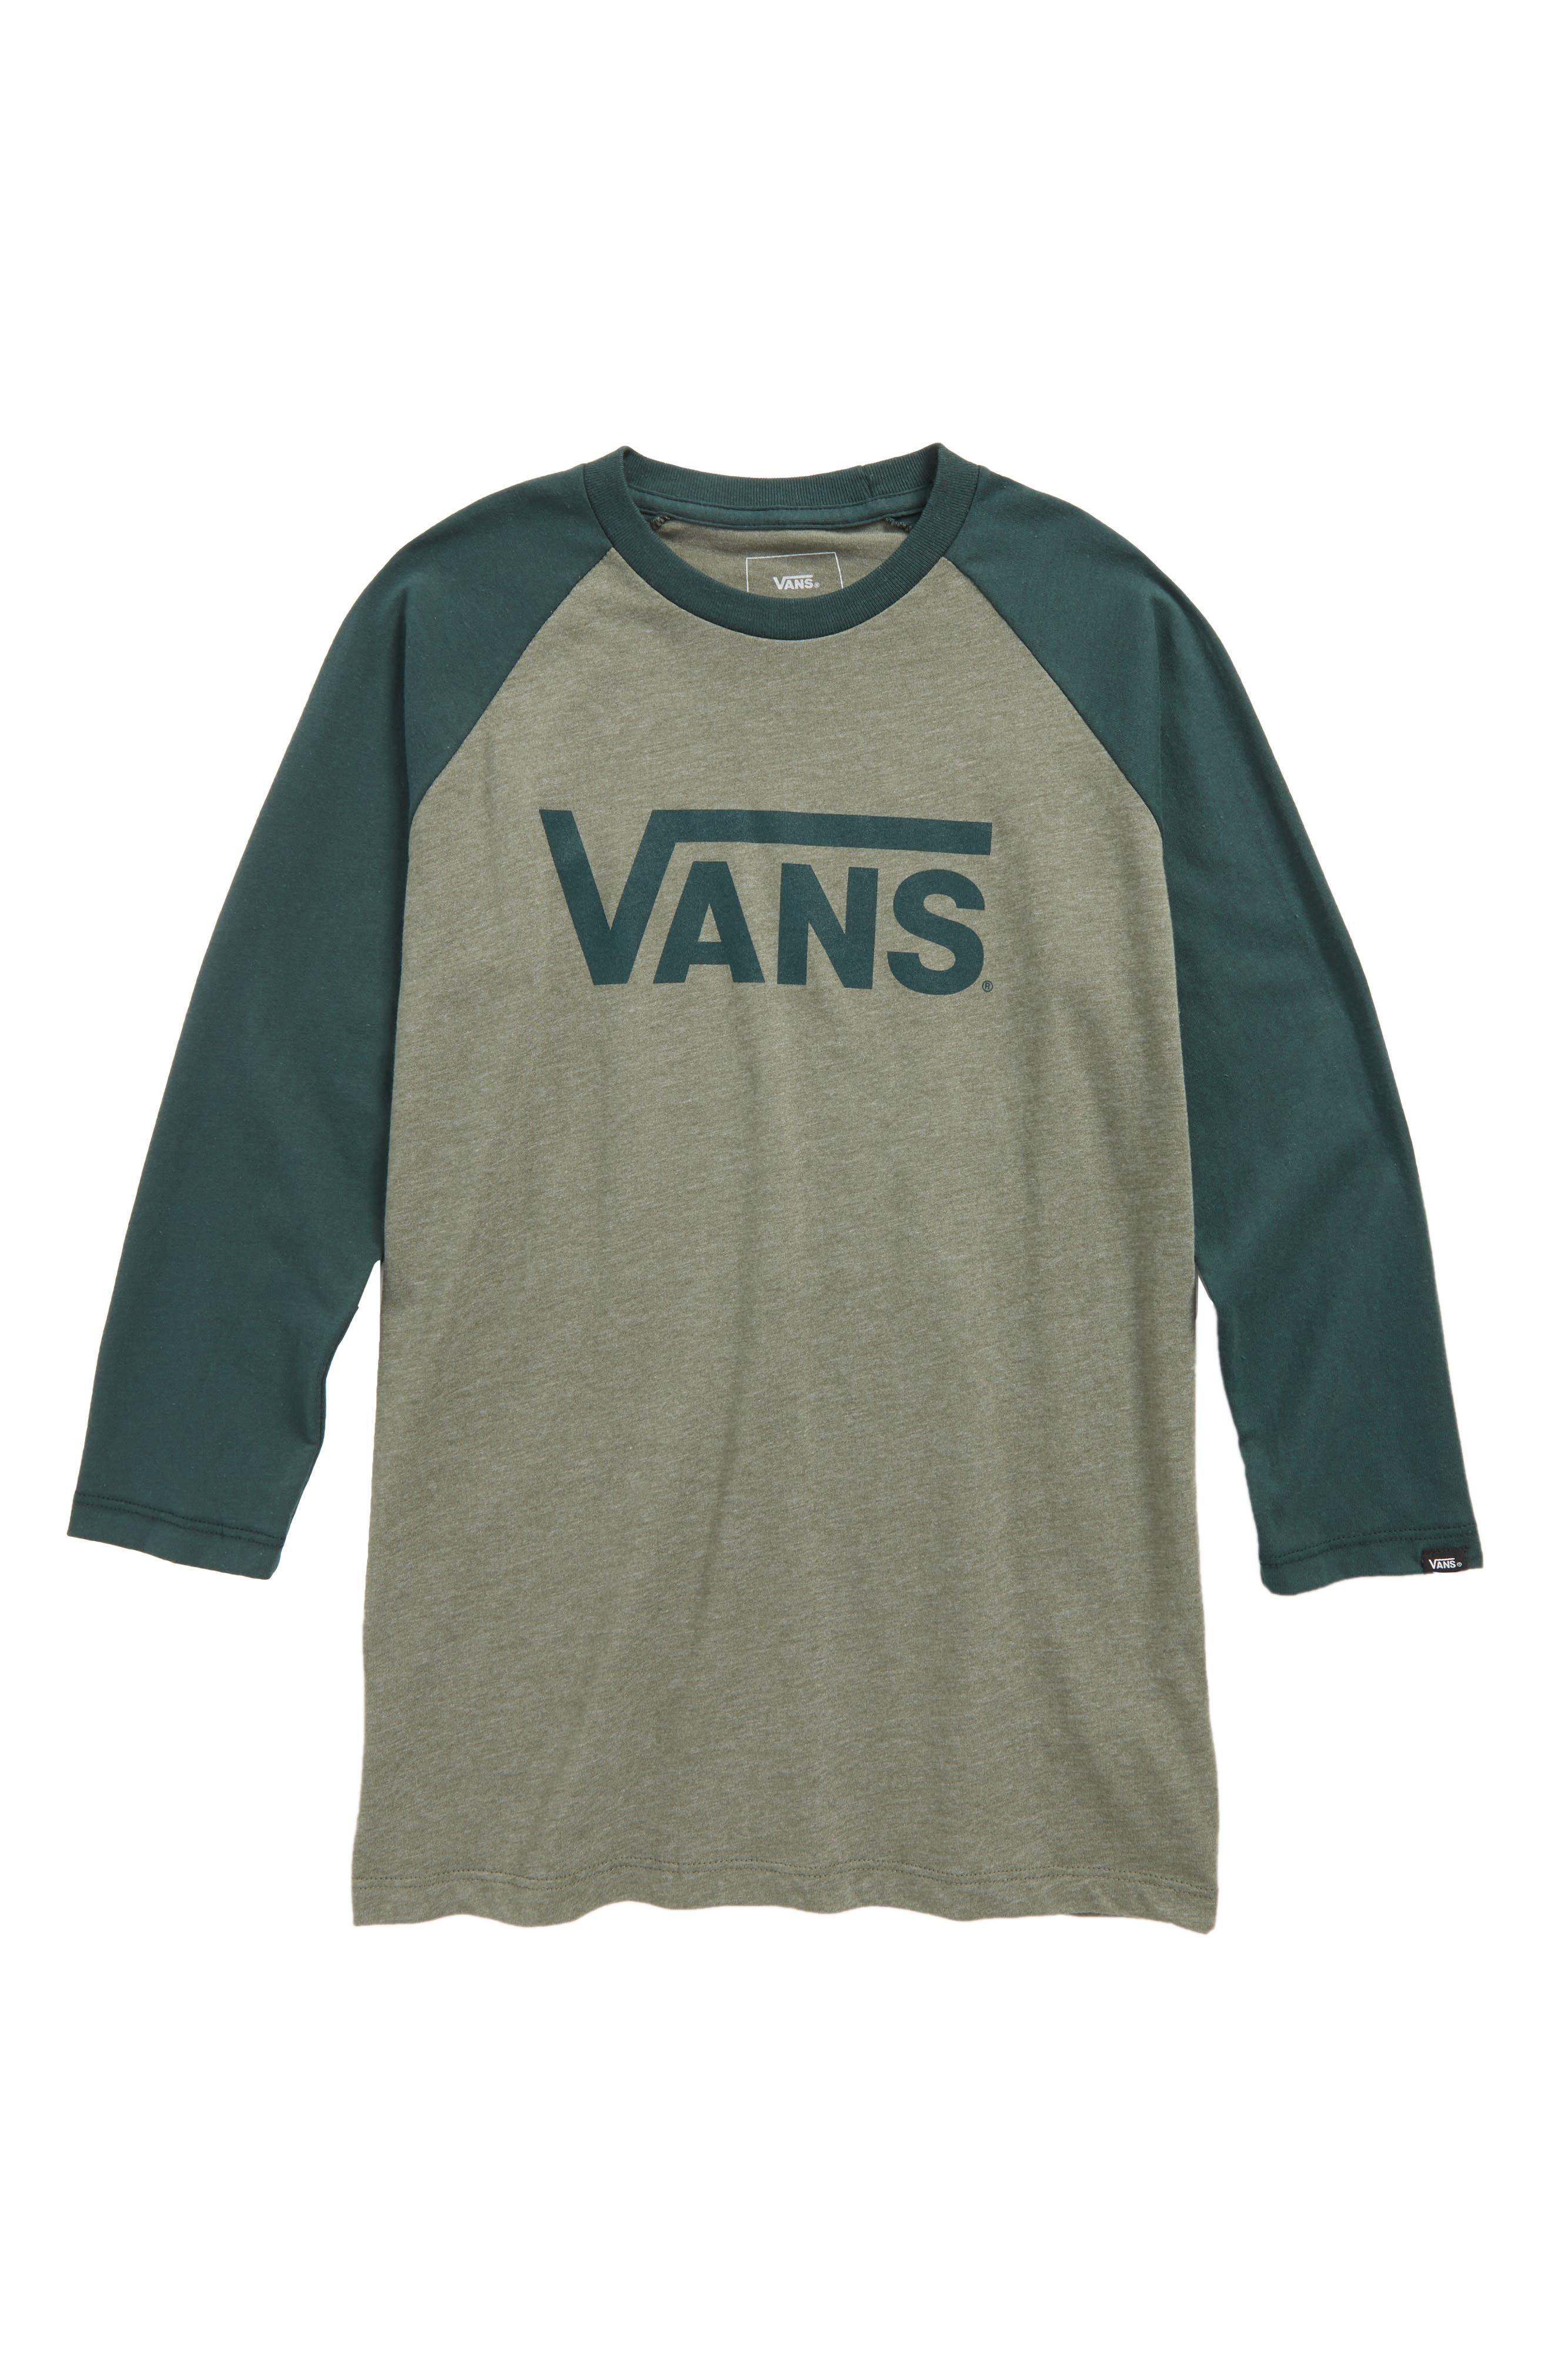 Alternate Image 1 Selected - Vans 'Classic' Logo Raglan Sleeve T-Shirt (Big Boys)